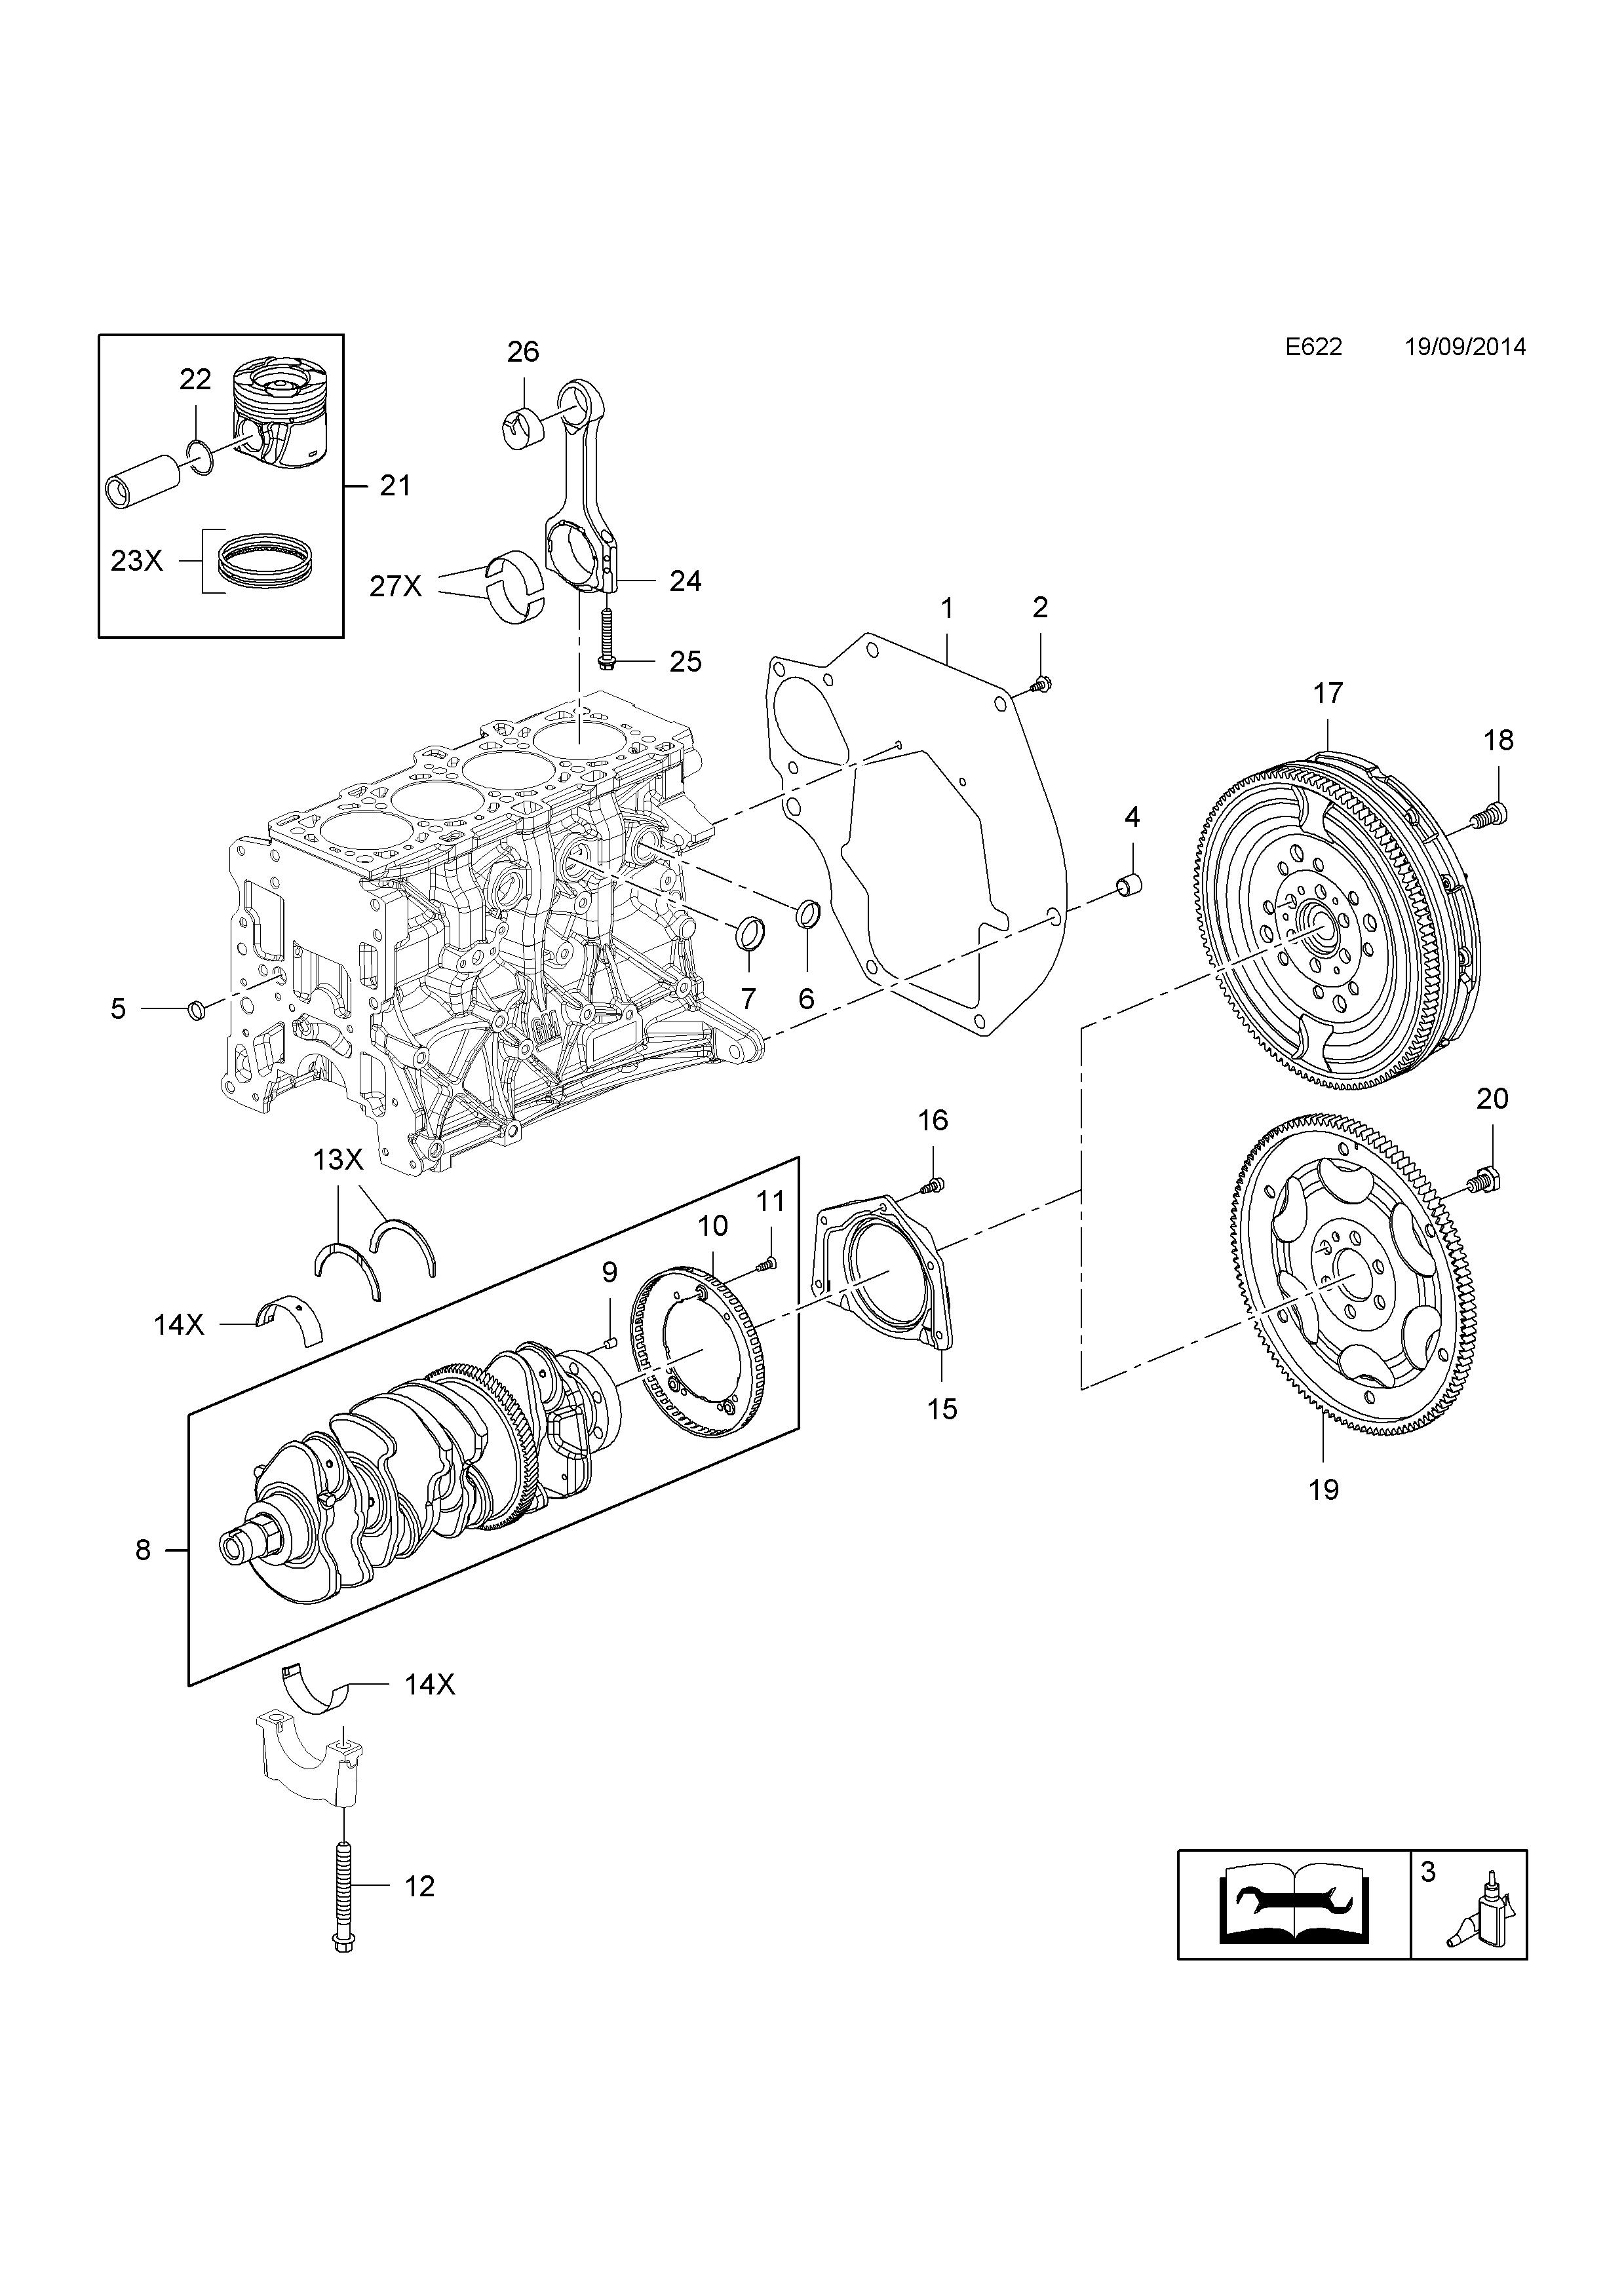 opel insignia 2009 e engine and clutch 9 b20dth lfs diesel 2015 Opel Meriva list of parts